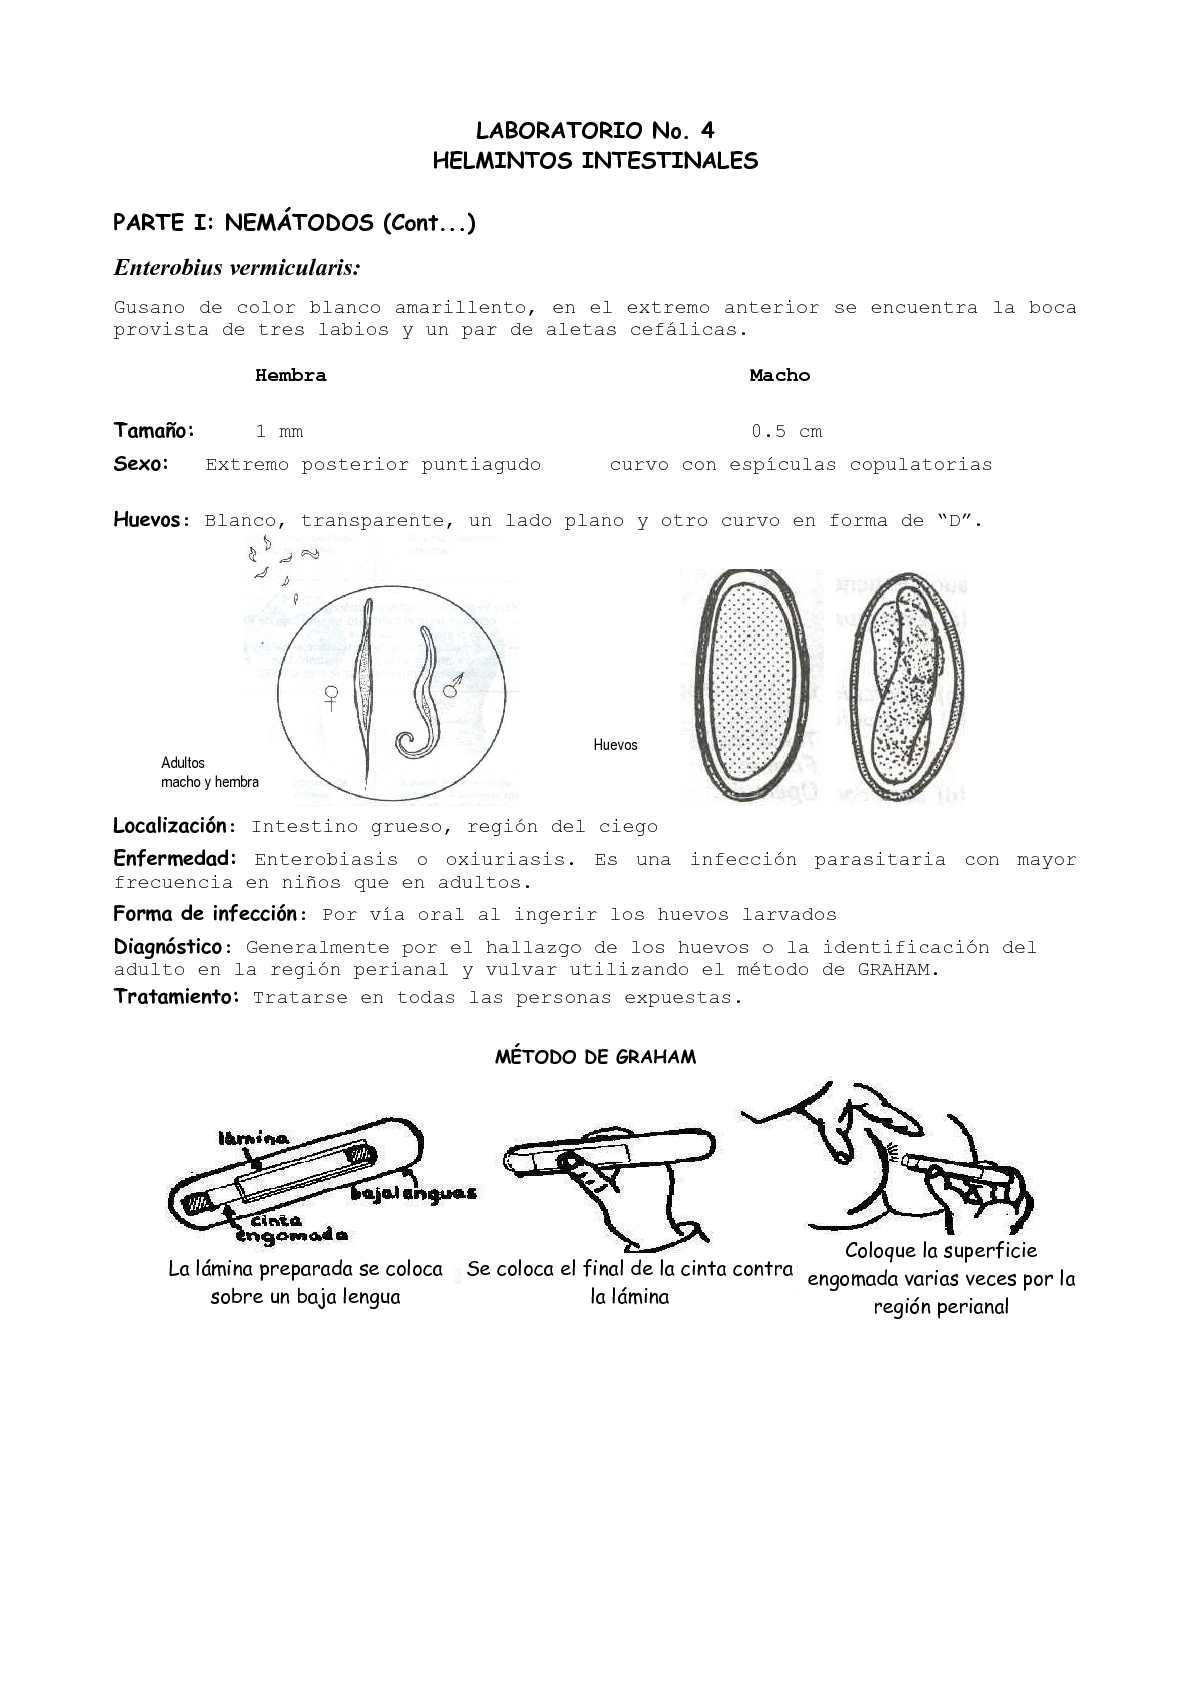 huevos de oxiuros vermicularis)